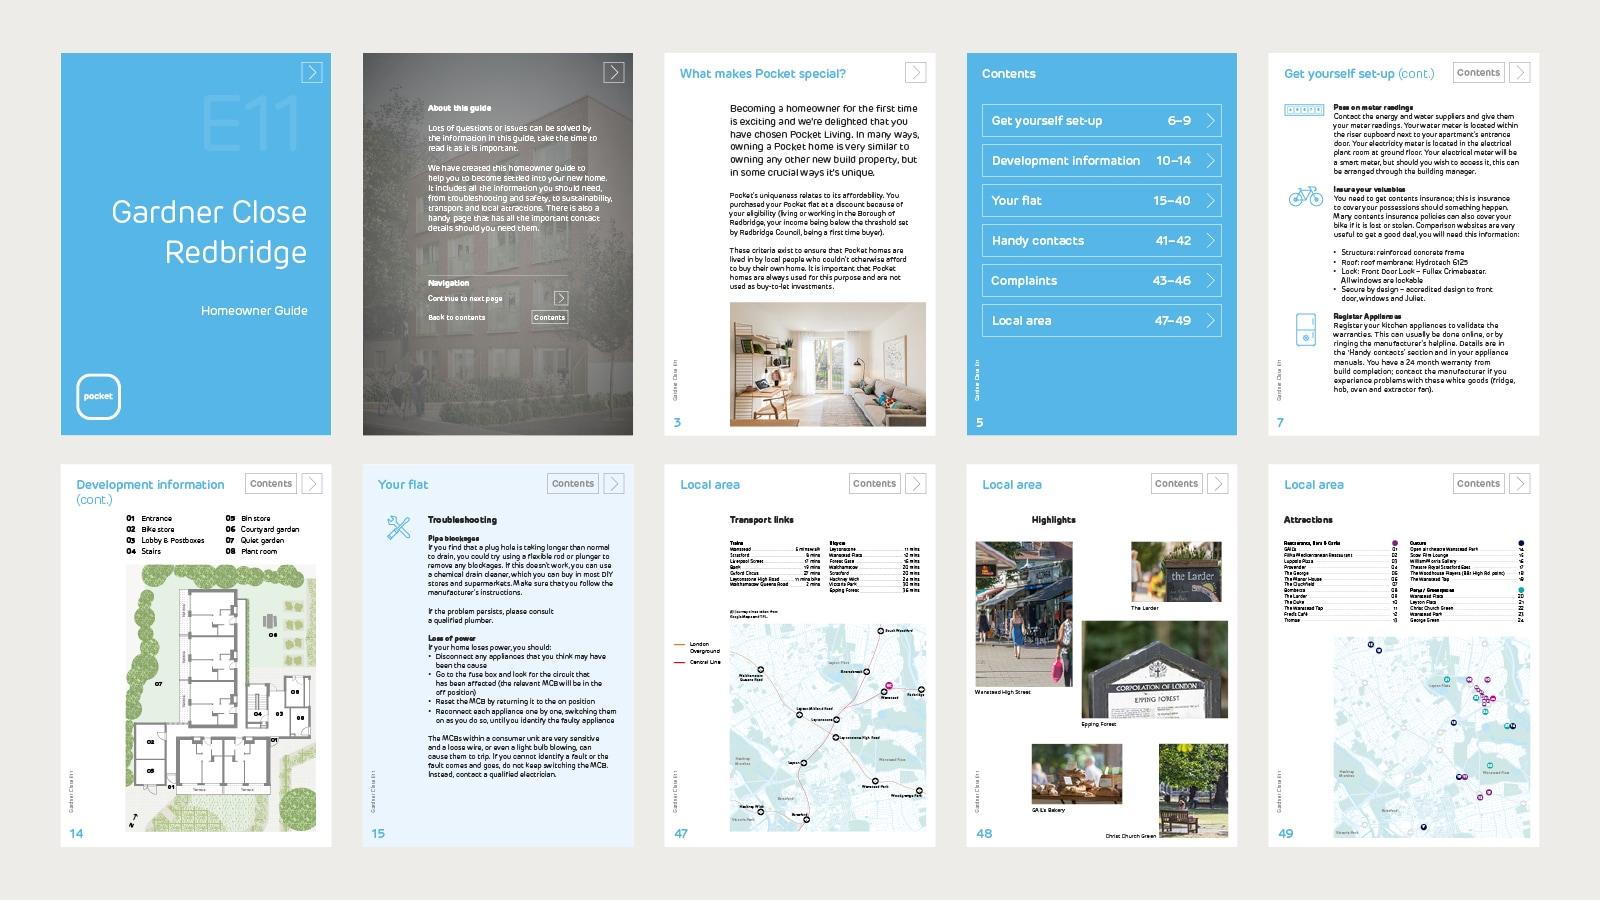 property-marketing-business-communications-branding-graphic-design-milton-keynes-london3